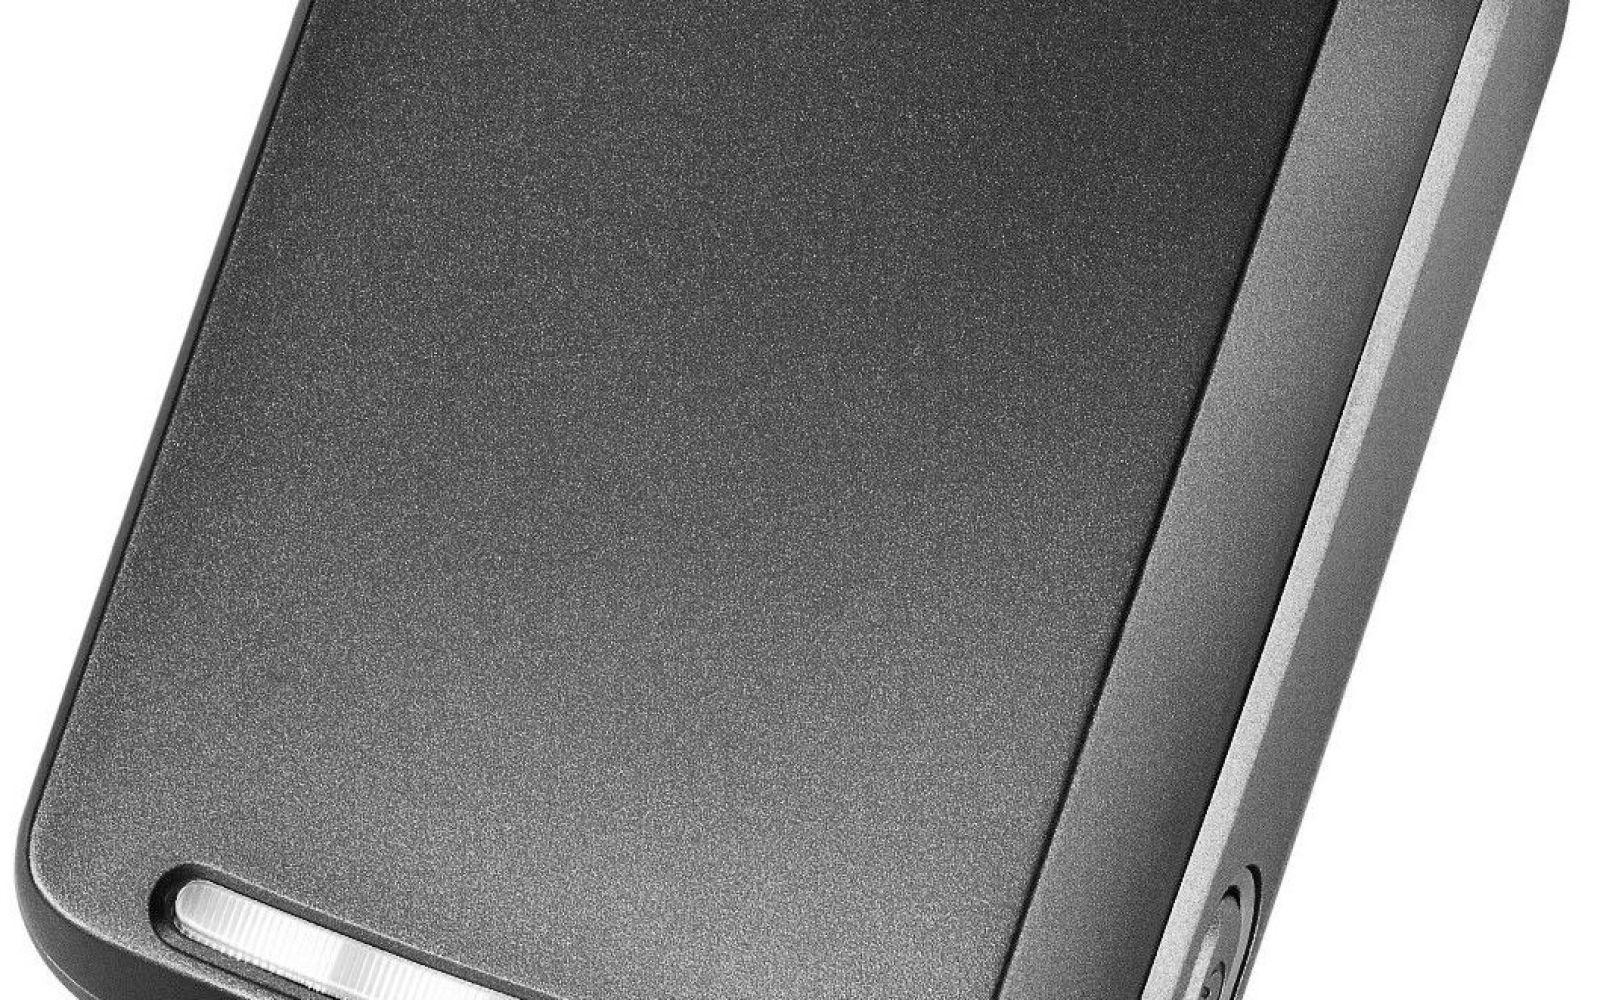 New Trent Travelpak PLUS External Charger for Smartphones & Tablets $19-$24 shipped (Reg. $42-$100)